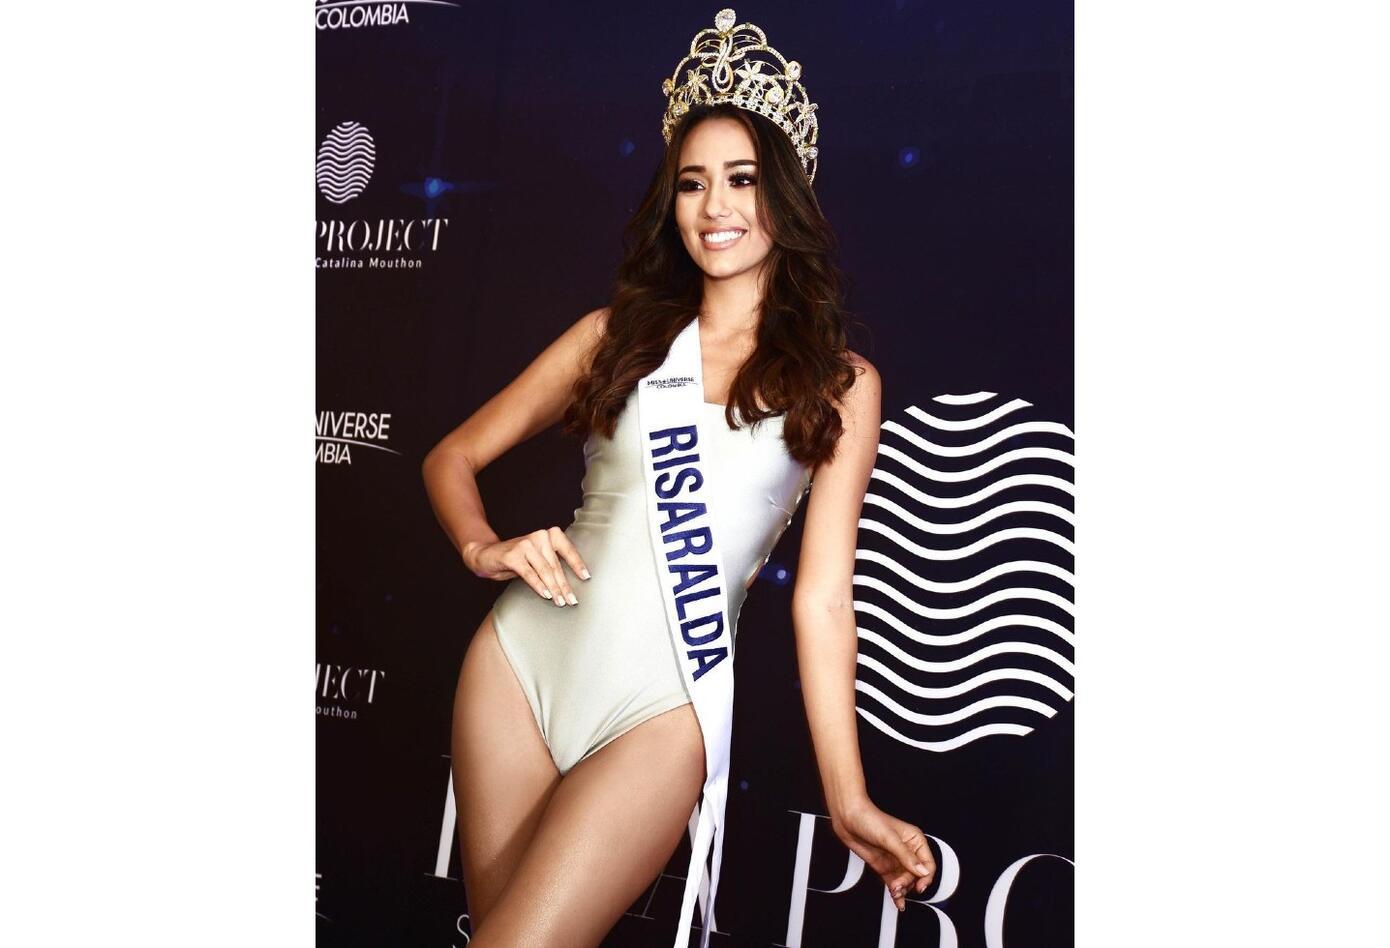 Miss Risaralda, Alejandra Buitrago